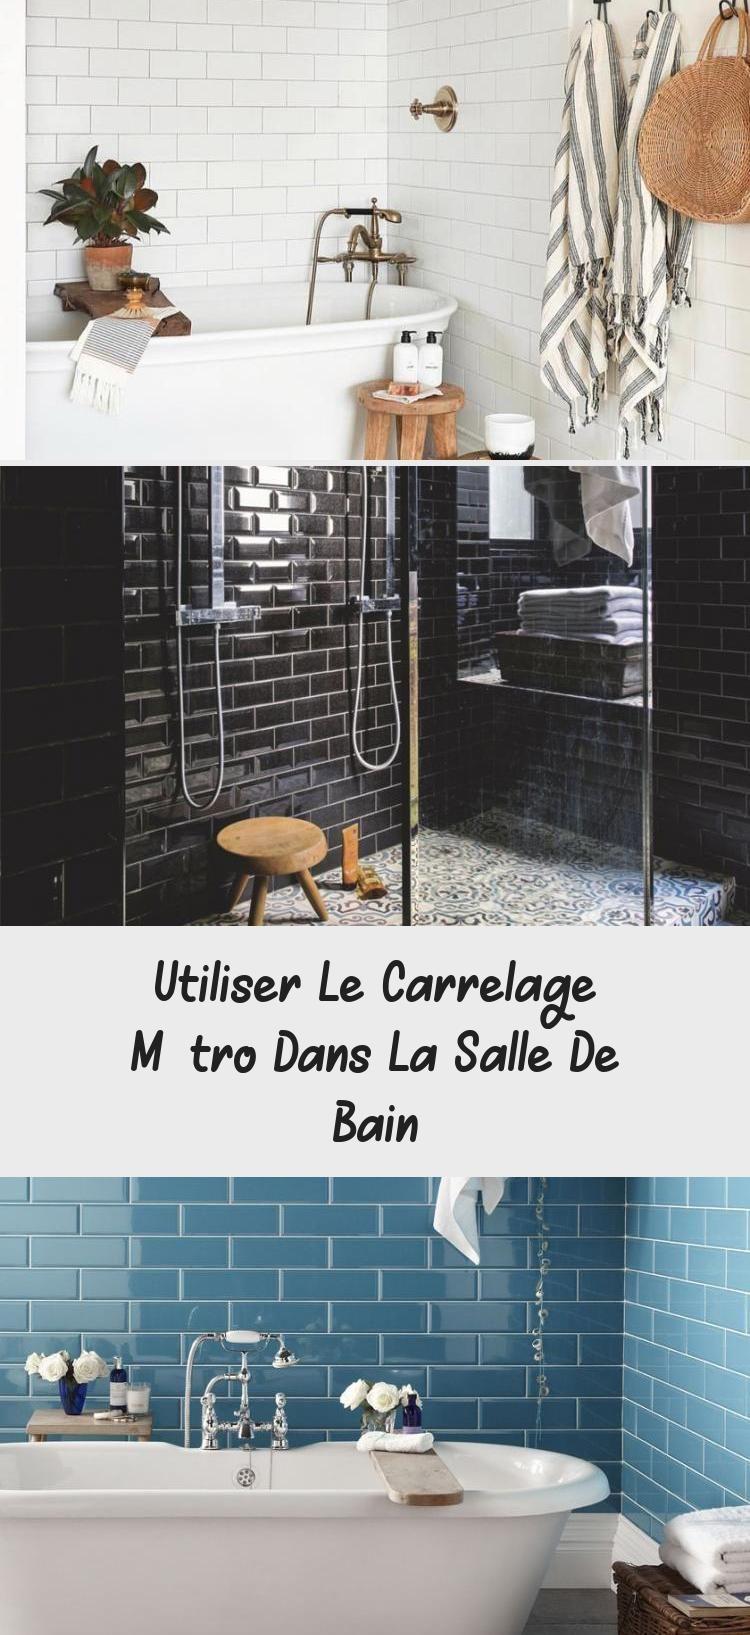 Utiliser Le Carrelage Metro Dans La Salle De Bain Vanity Bathroom